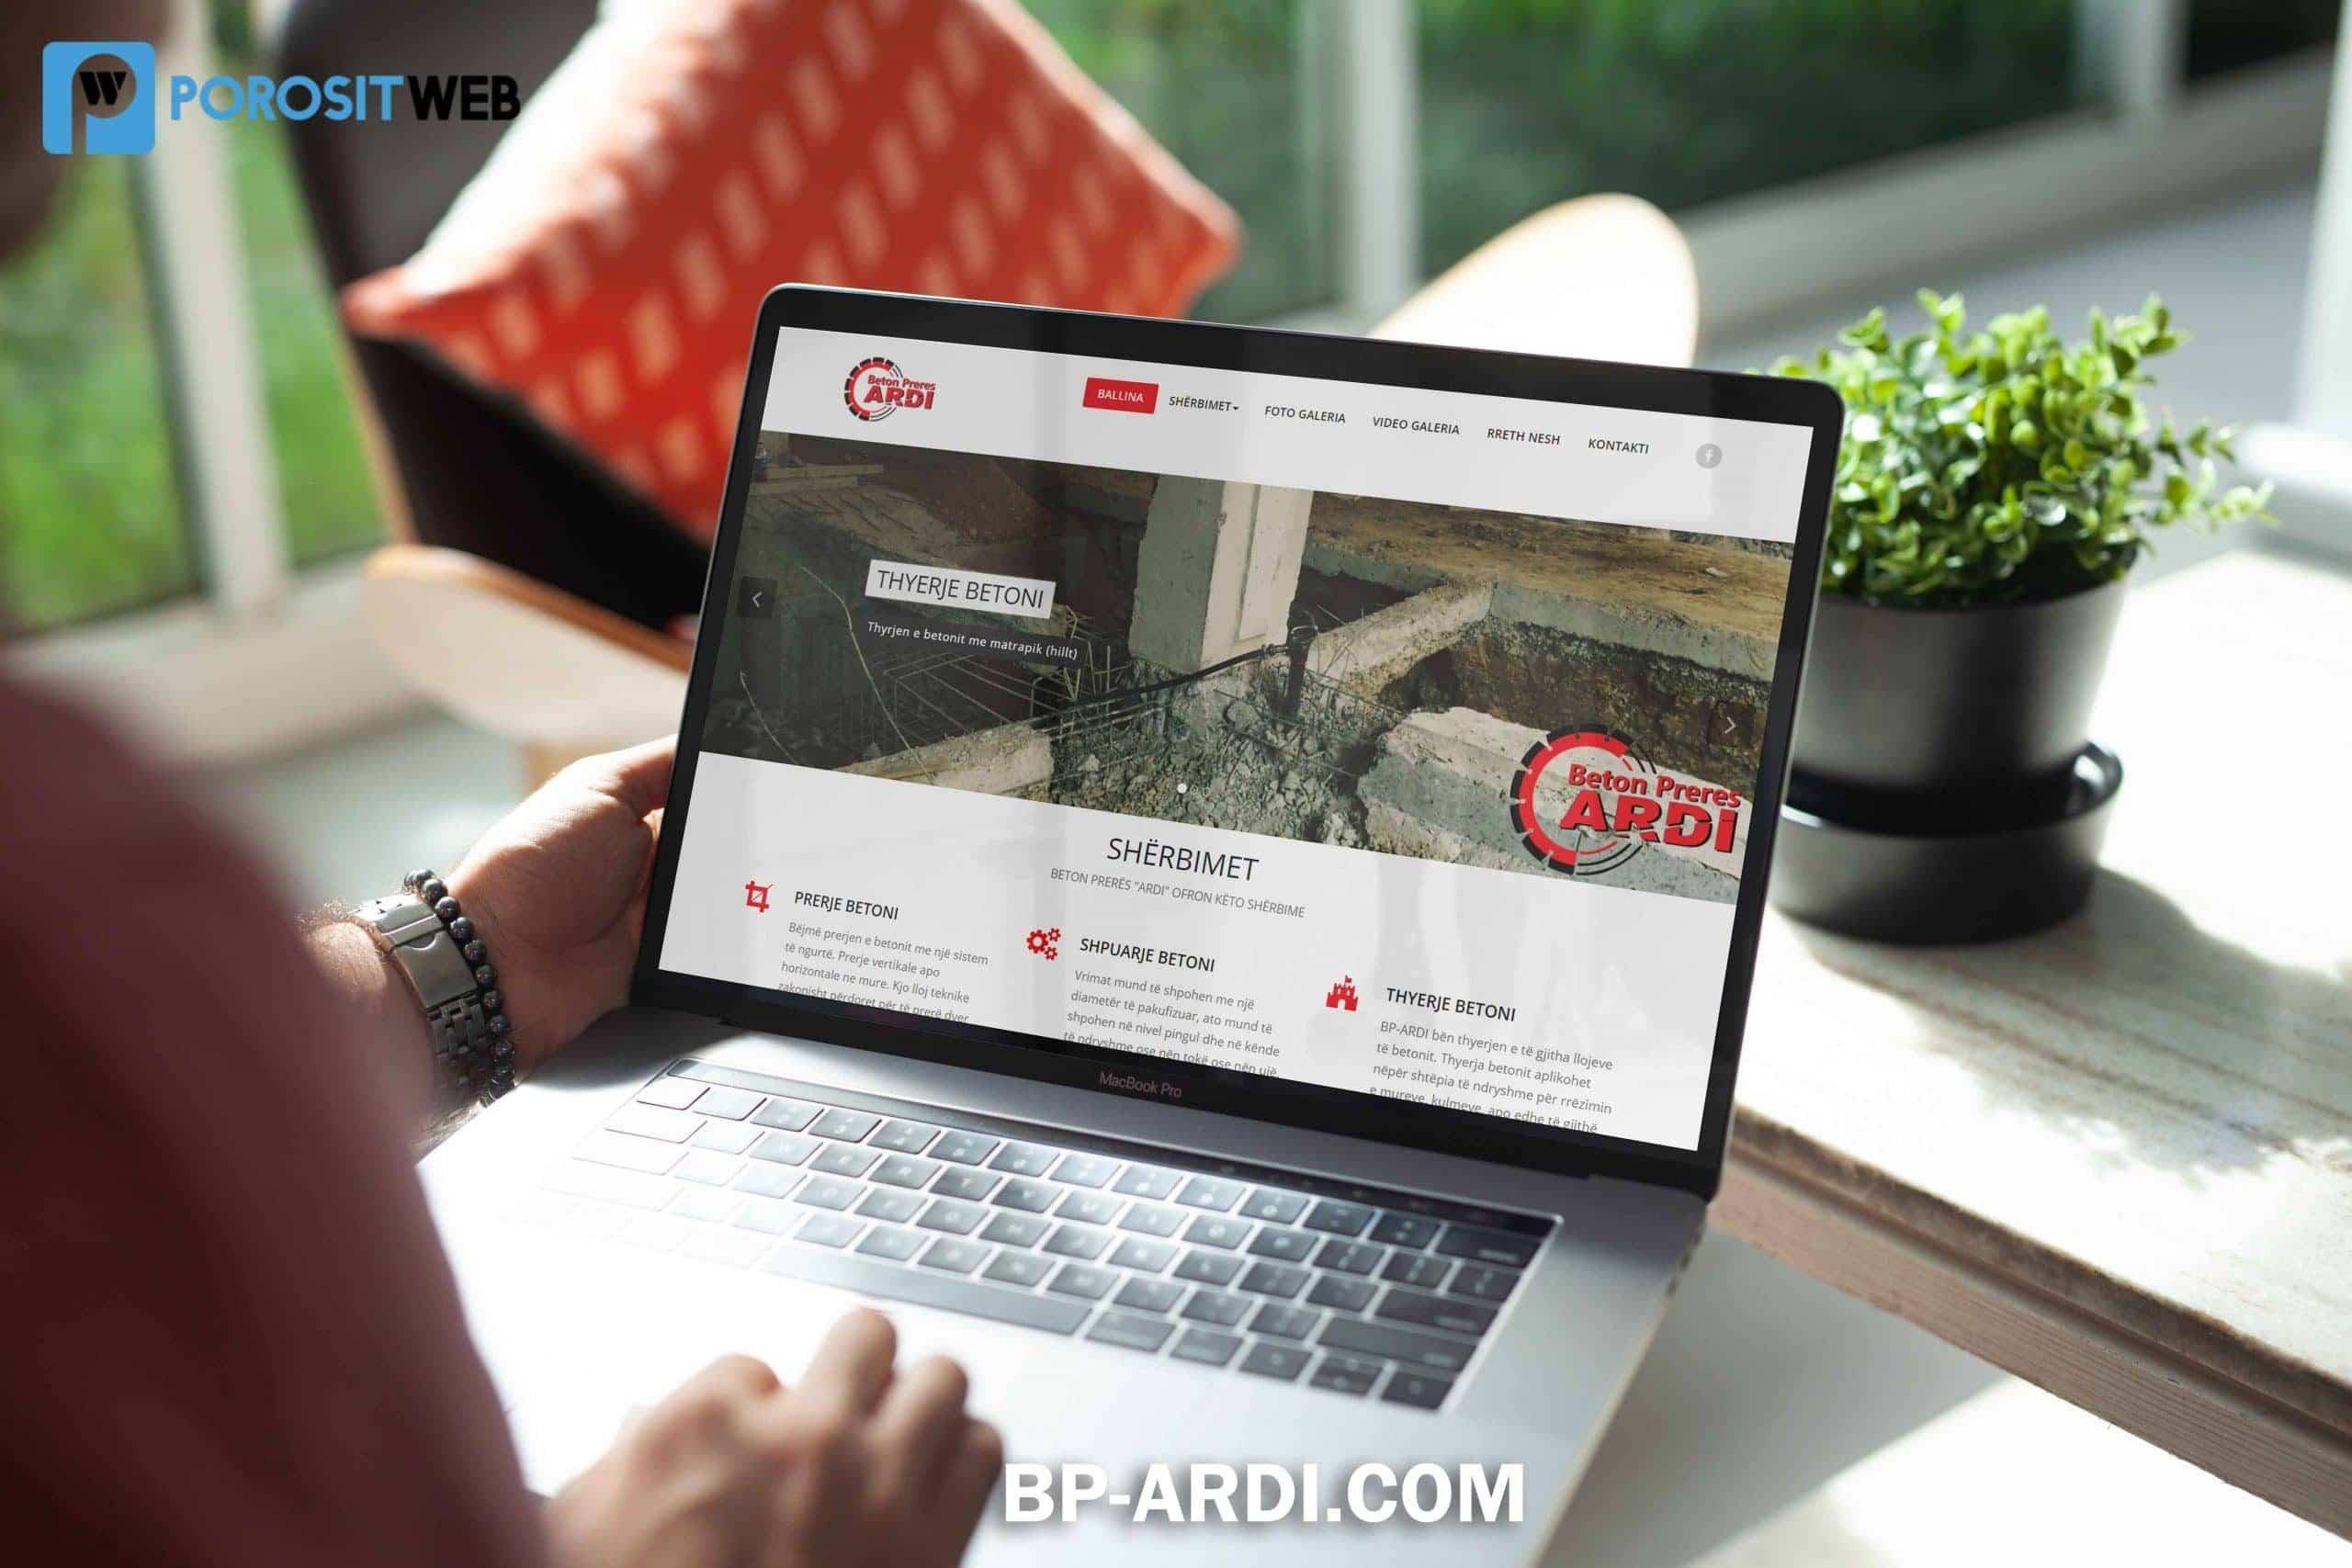 webfaqe per gurethyes